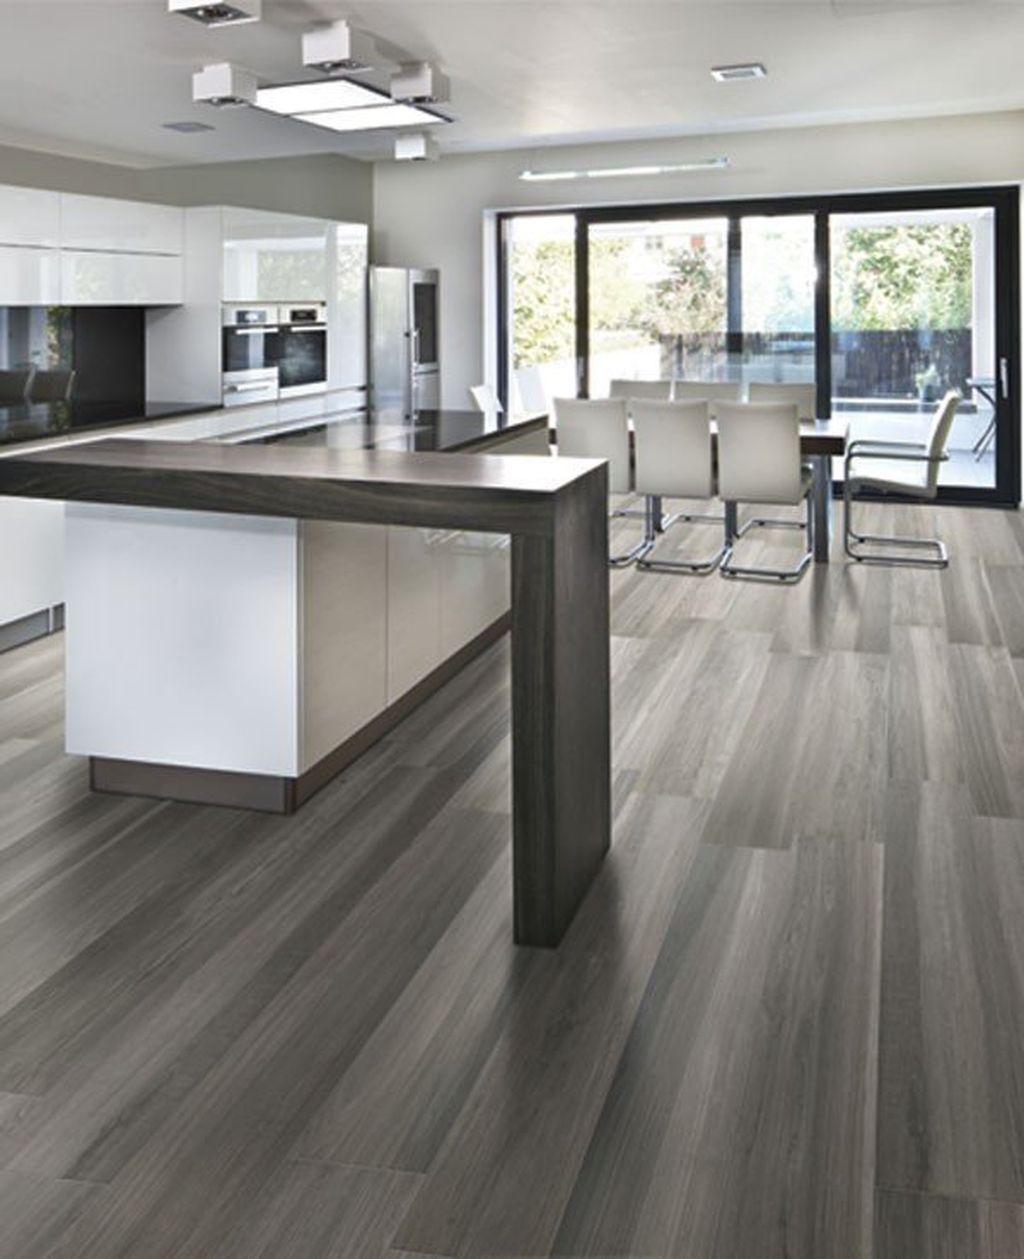 60 lovely modern and minimalist kitchen designs modern kitchen design kitchen flooring on kitchen ideas minimalist id=50816